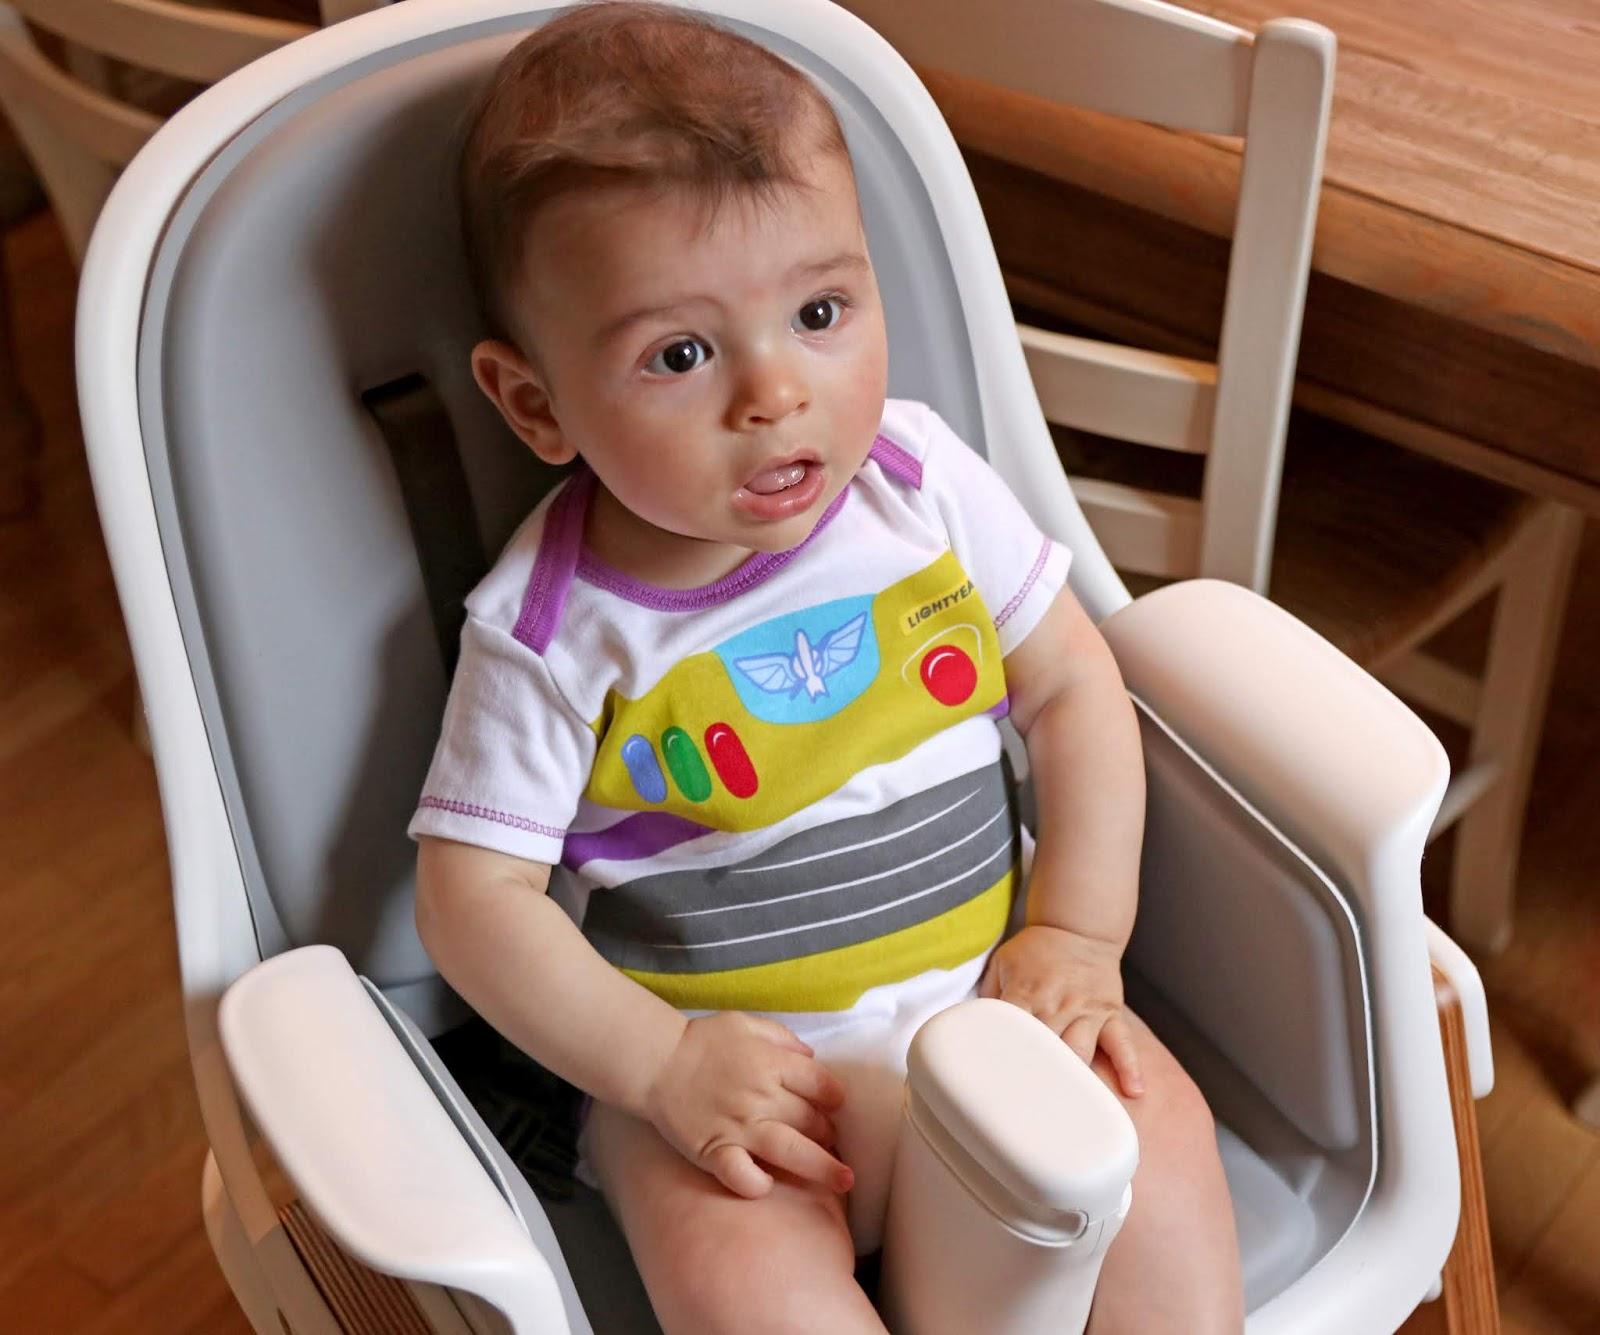 Toy Story Baby Bodysuits 5-Pack buzz lightyear onesie